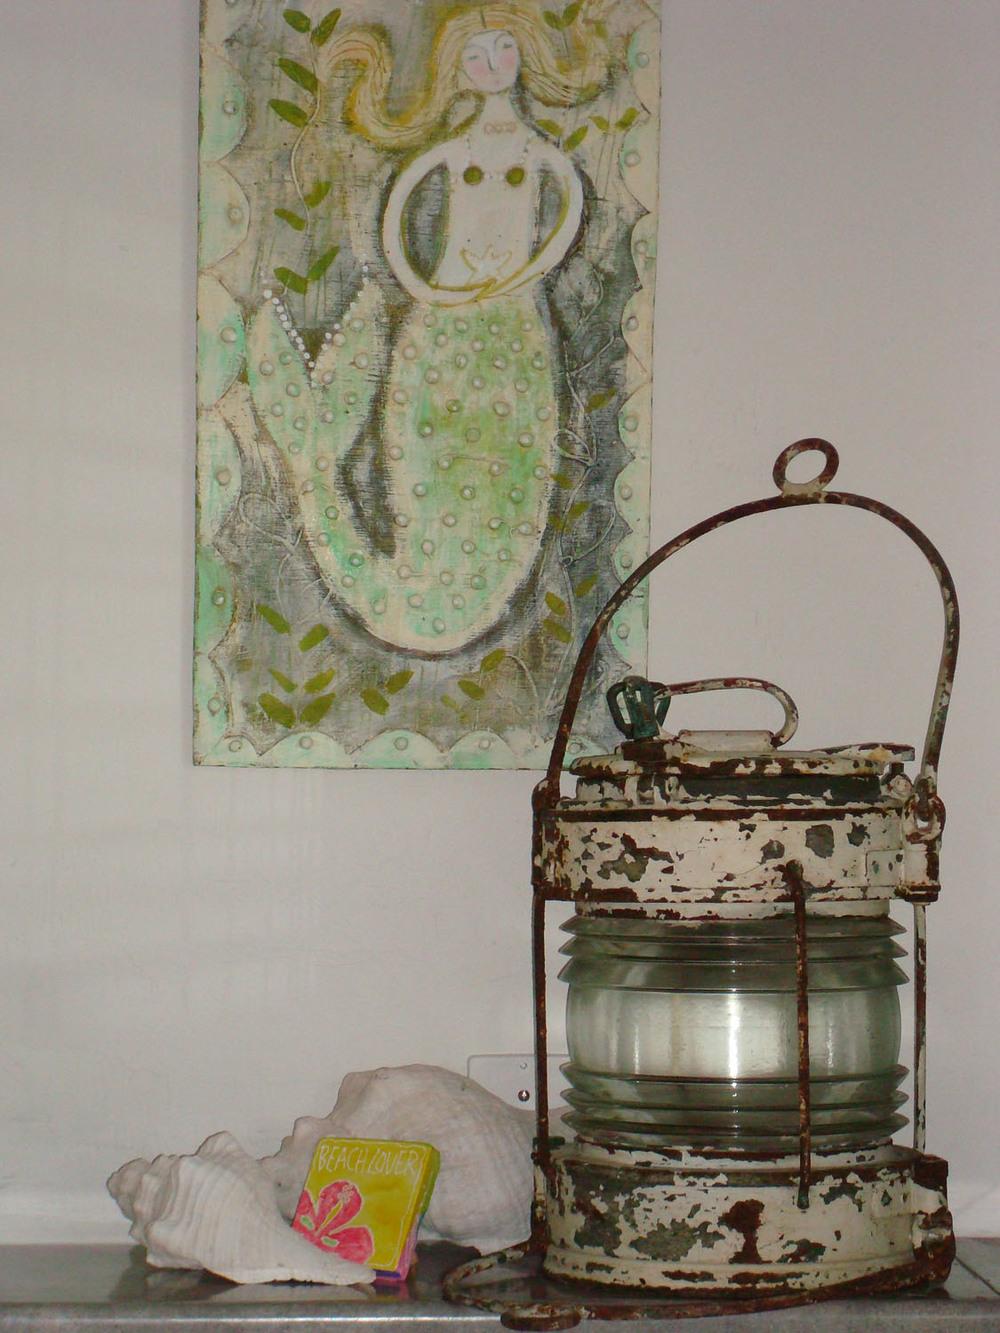 island-beach-house-renovation-decor-accents-old-lamp-mermaid-wall-art03.jpg